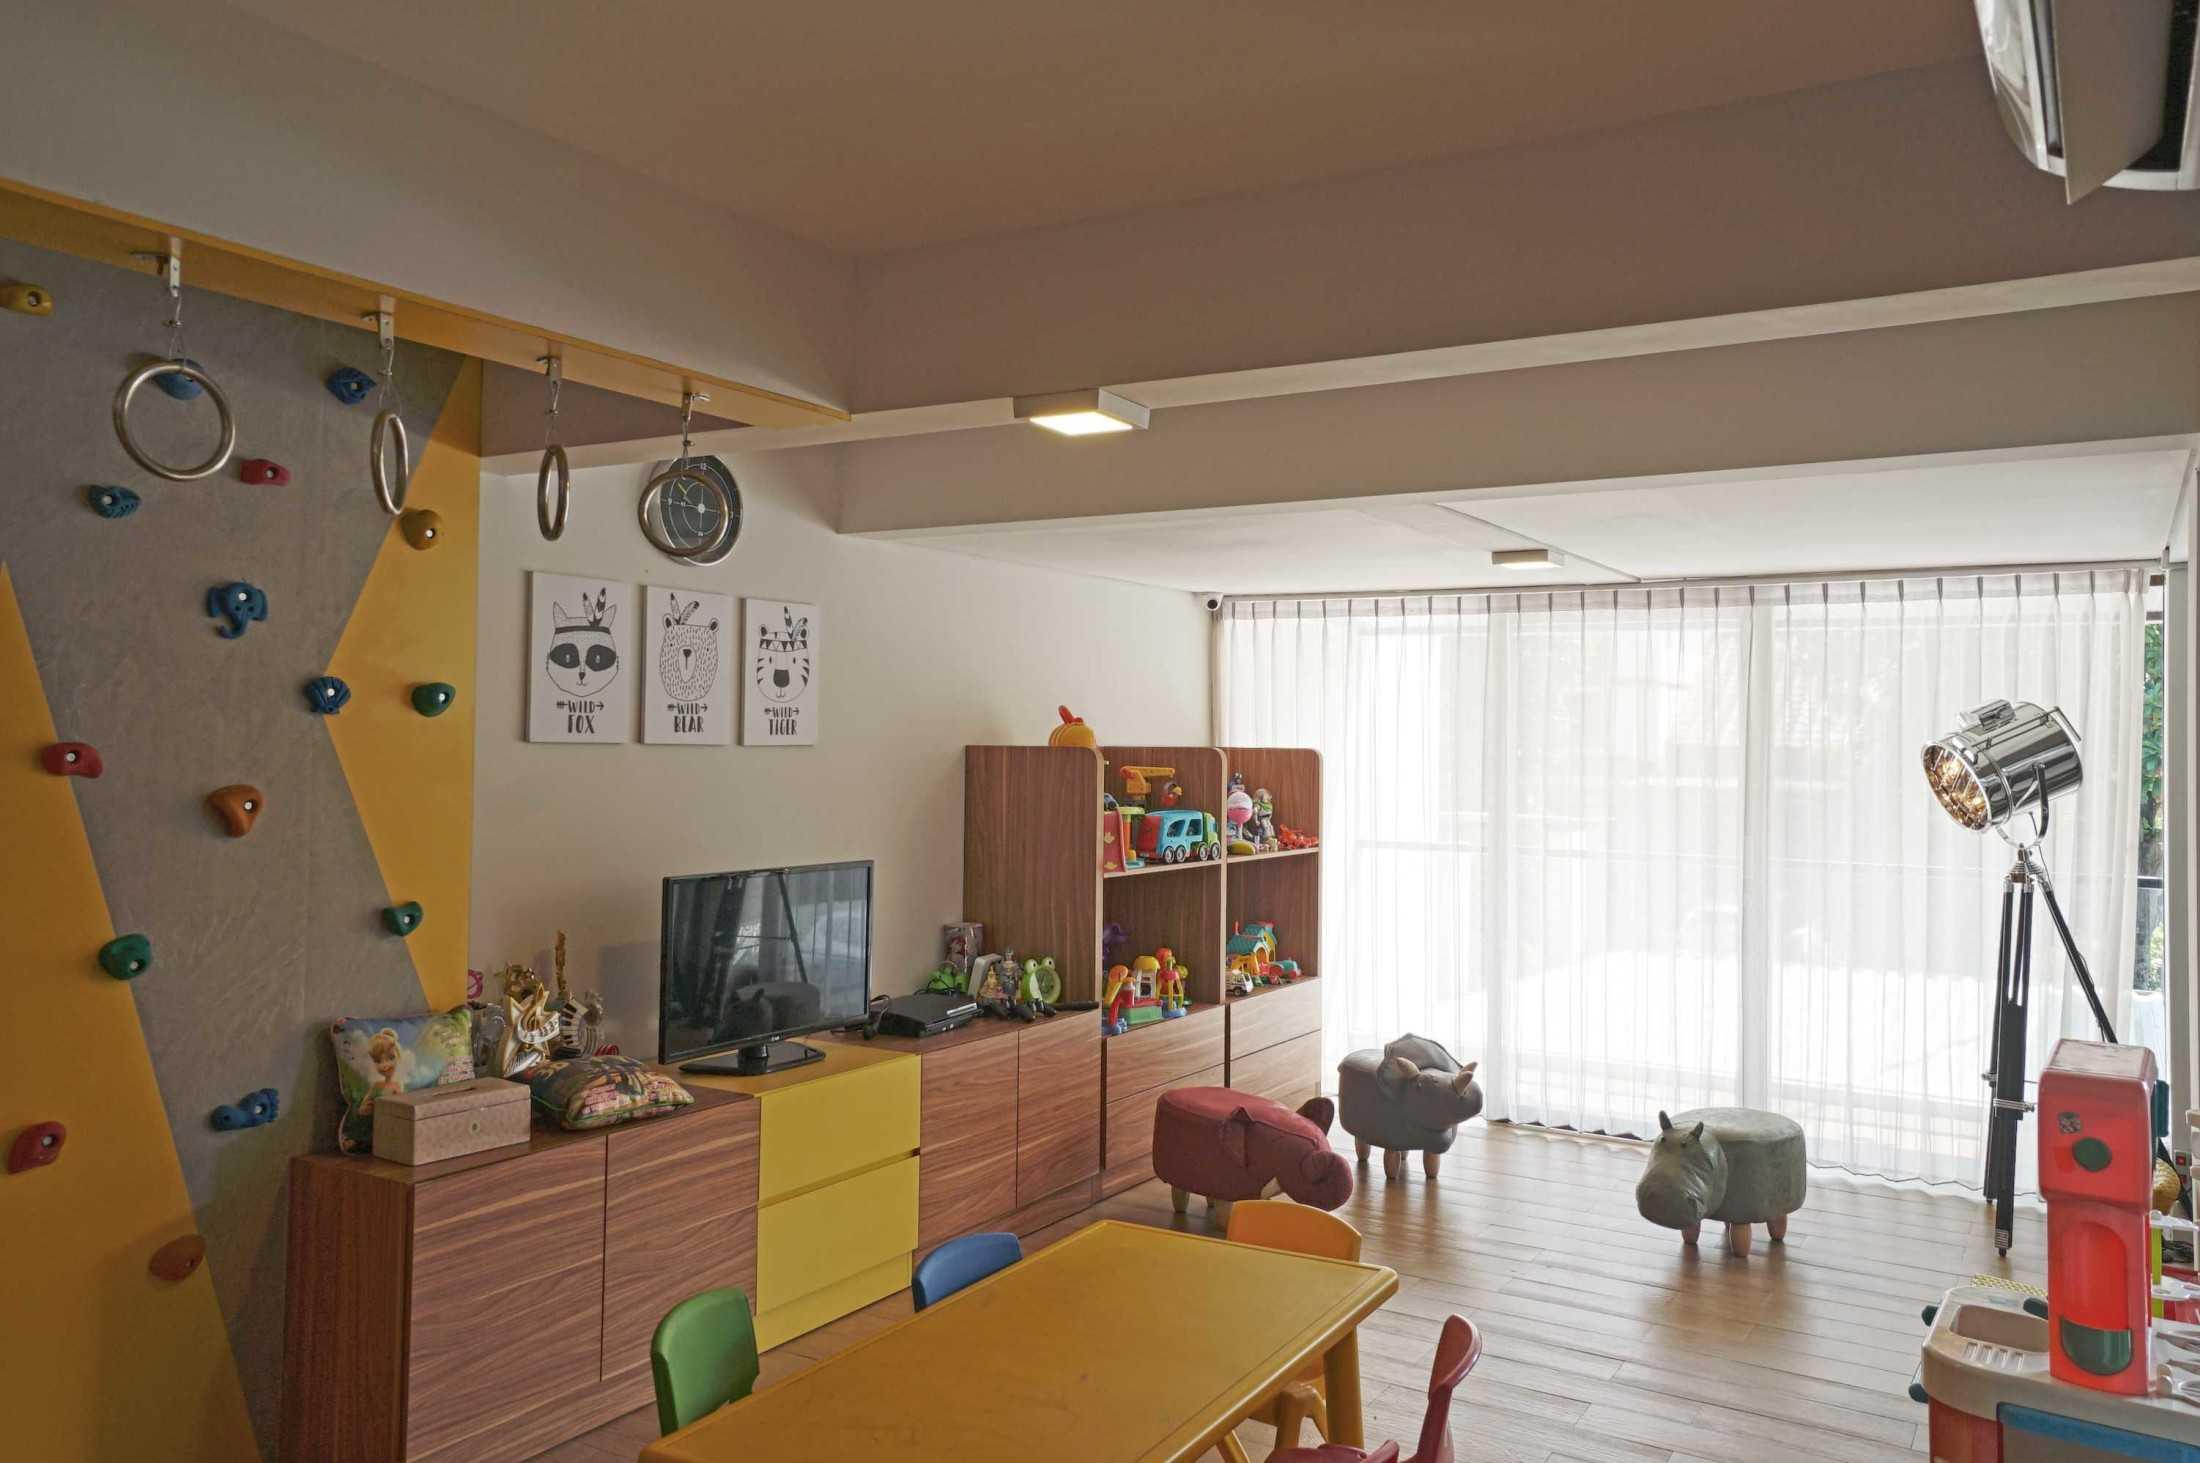 Rendic Ho Dw House Surabaya, Kota Sby, Jawa Timur, Indonesia Surabaya, Kota Sby, Jawa Timur, Indonesia Rendic-Ho-Dw-House  107069